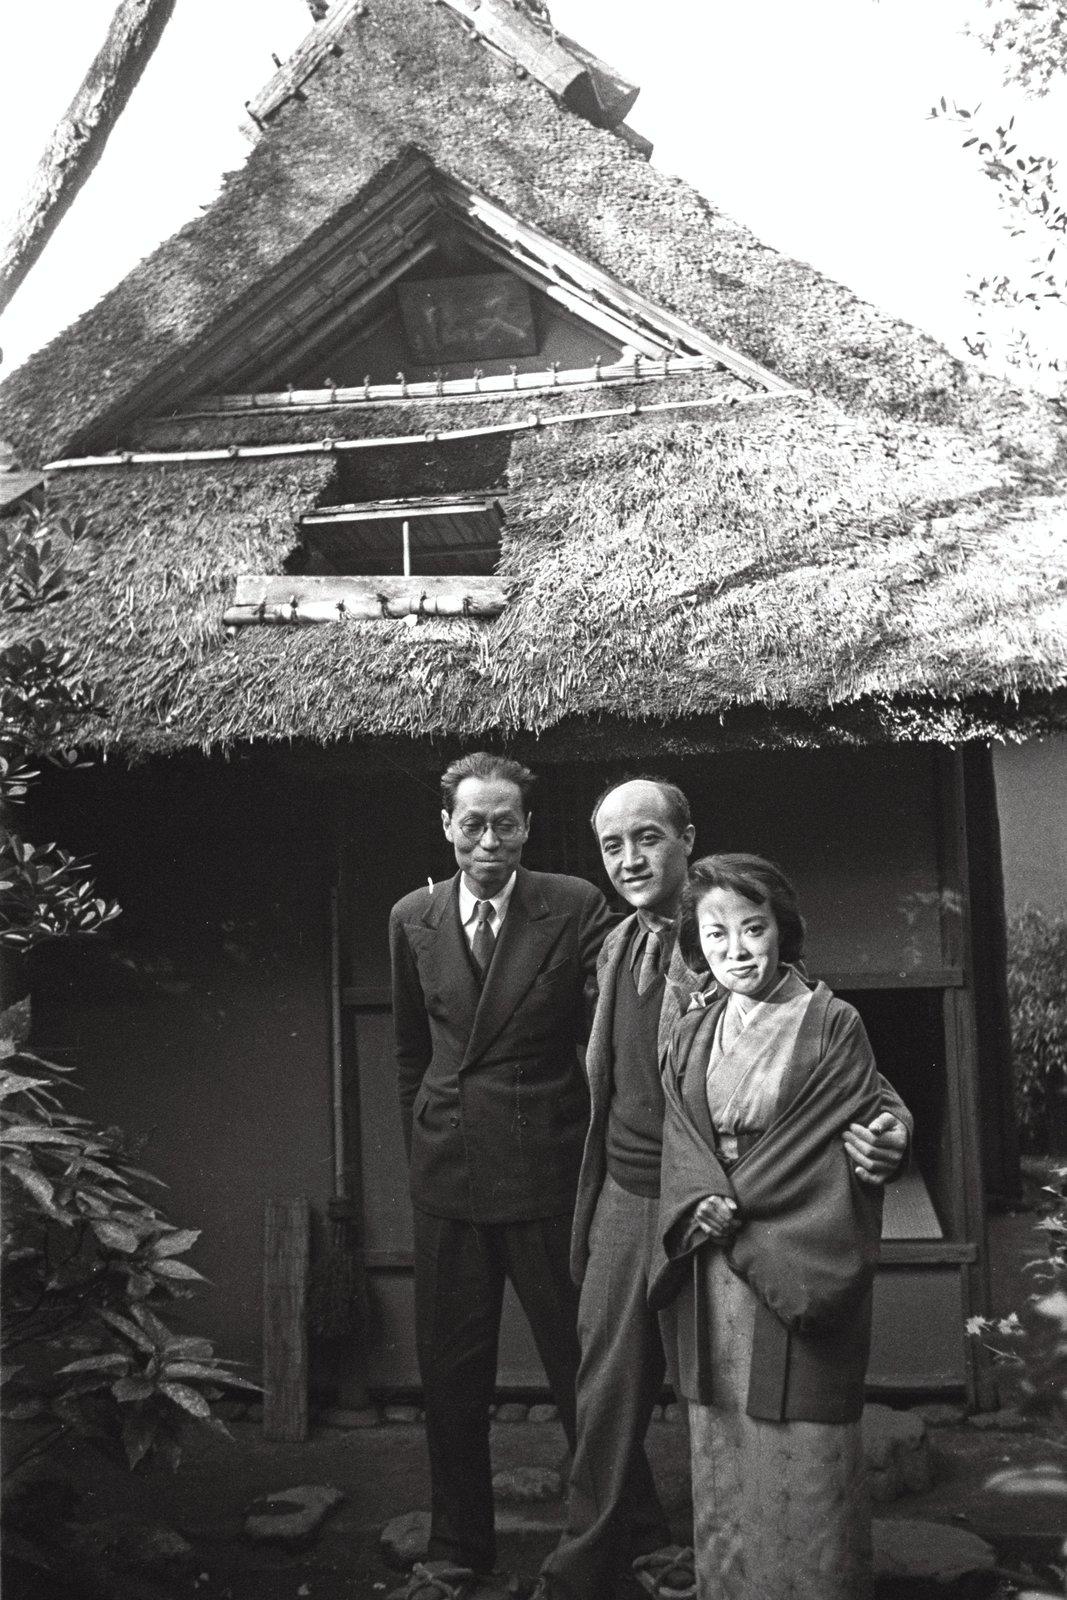 Saburo Hasegawa, Isamu Noguchi and Yoshiko Yamaguchi at Uransenke Konnichi - an estate, Kyoto, c. 1952  Photo 6 of 7 in How a Friendship Between Isamu Noguchi and Saburo Hasegawa Helped Shape Midcentury Design